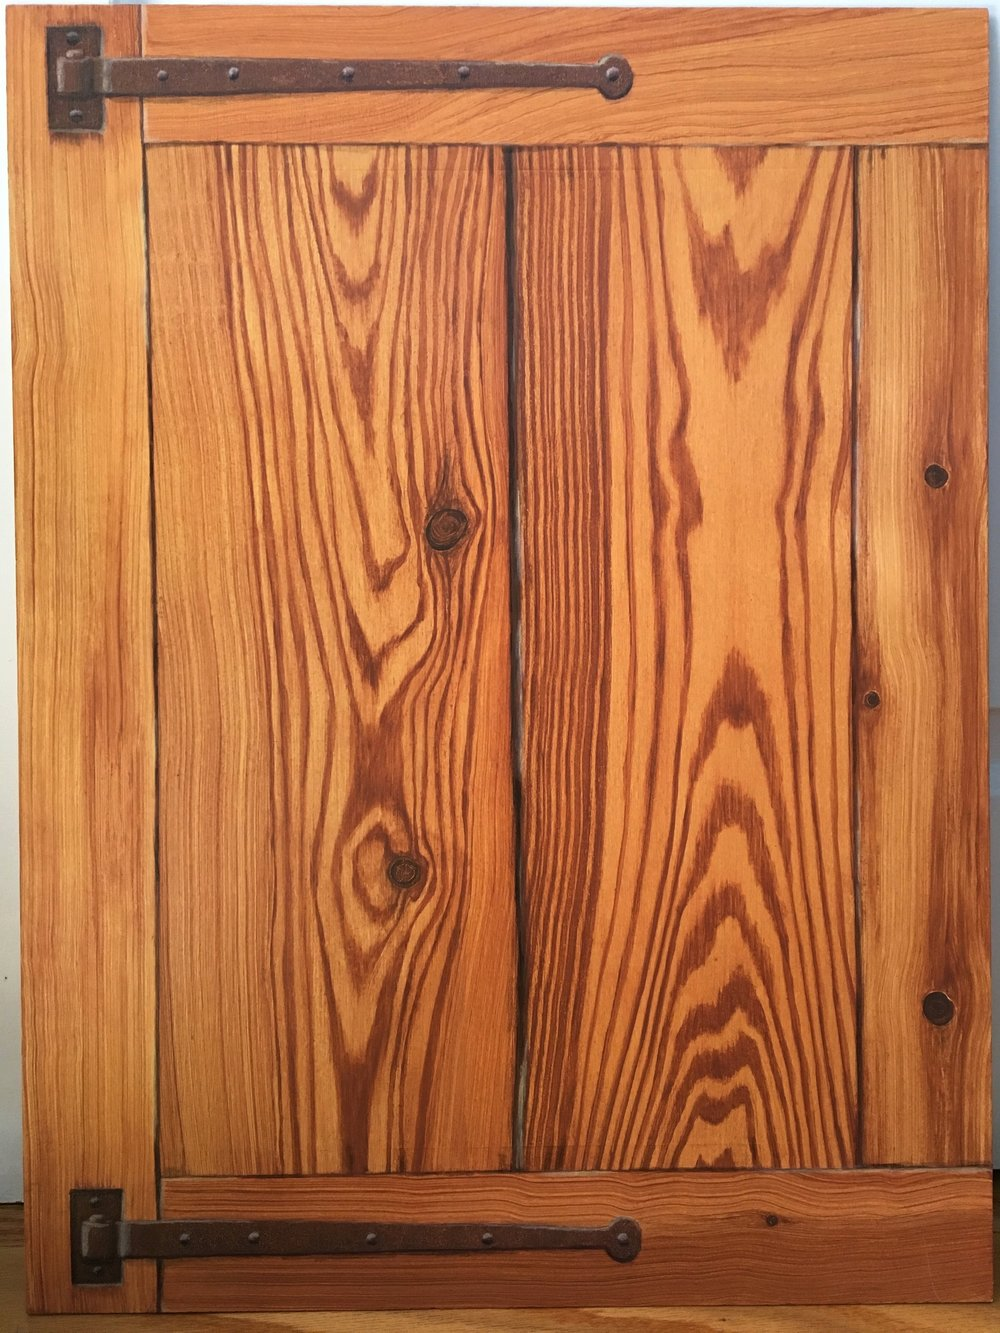 "Longleaf pine with rusty hinges<br>Acrylic on 18"" x 24"" masonite"